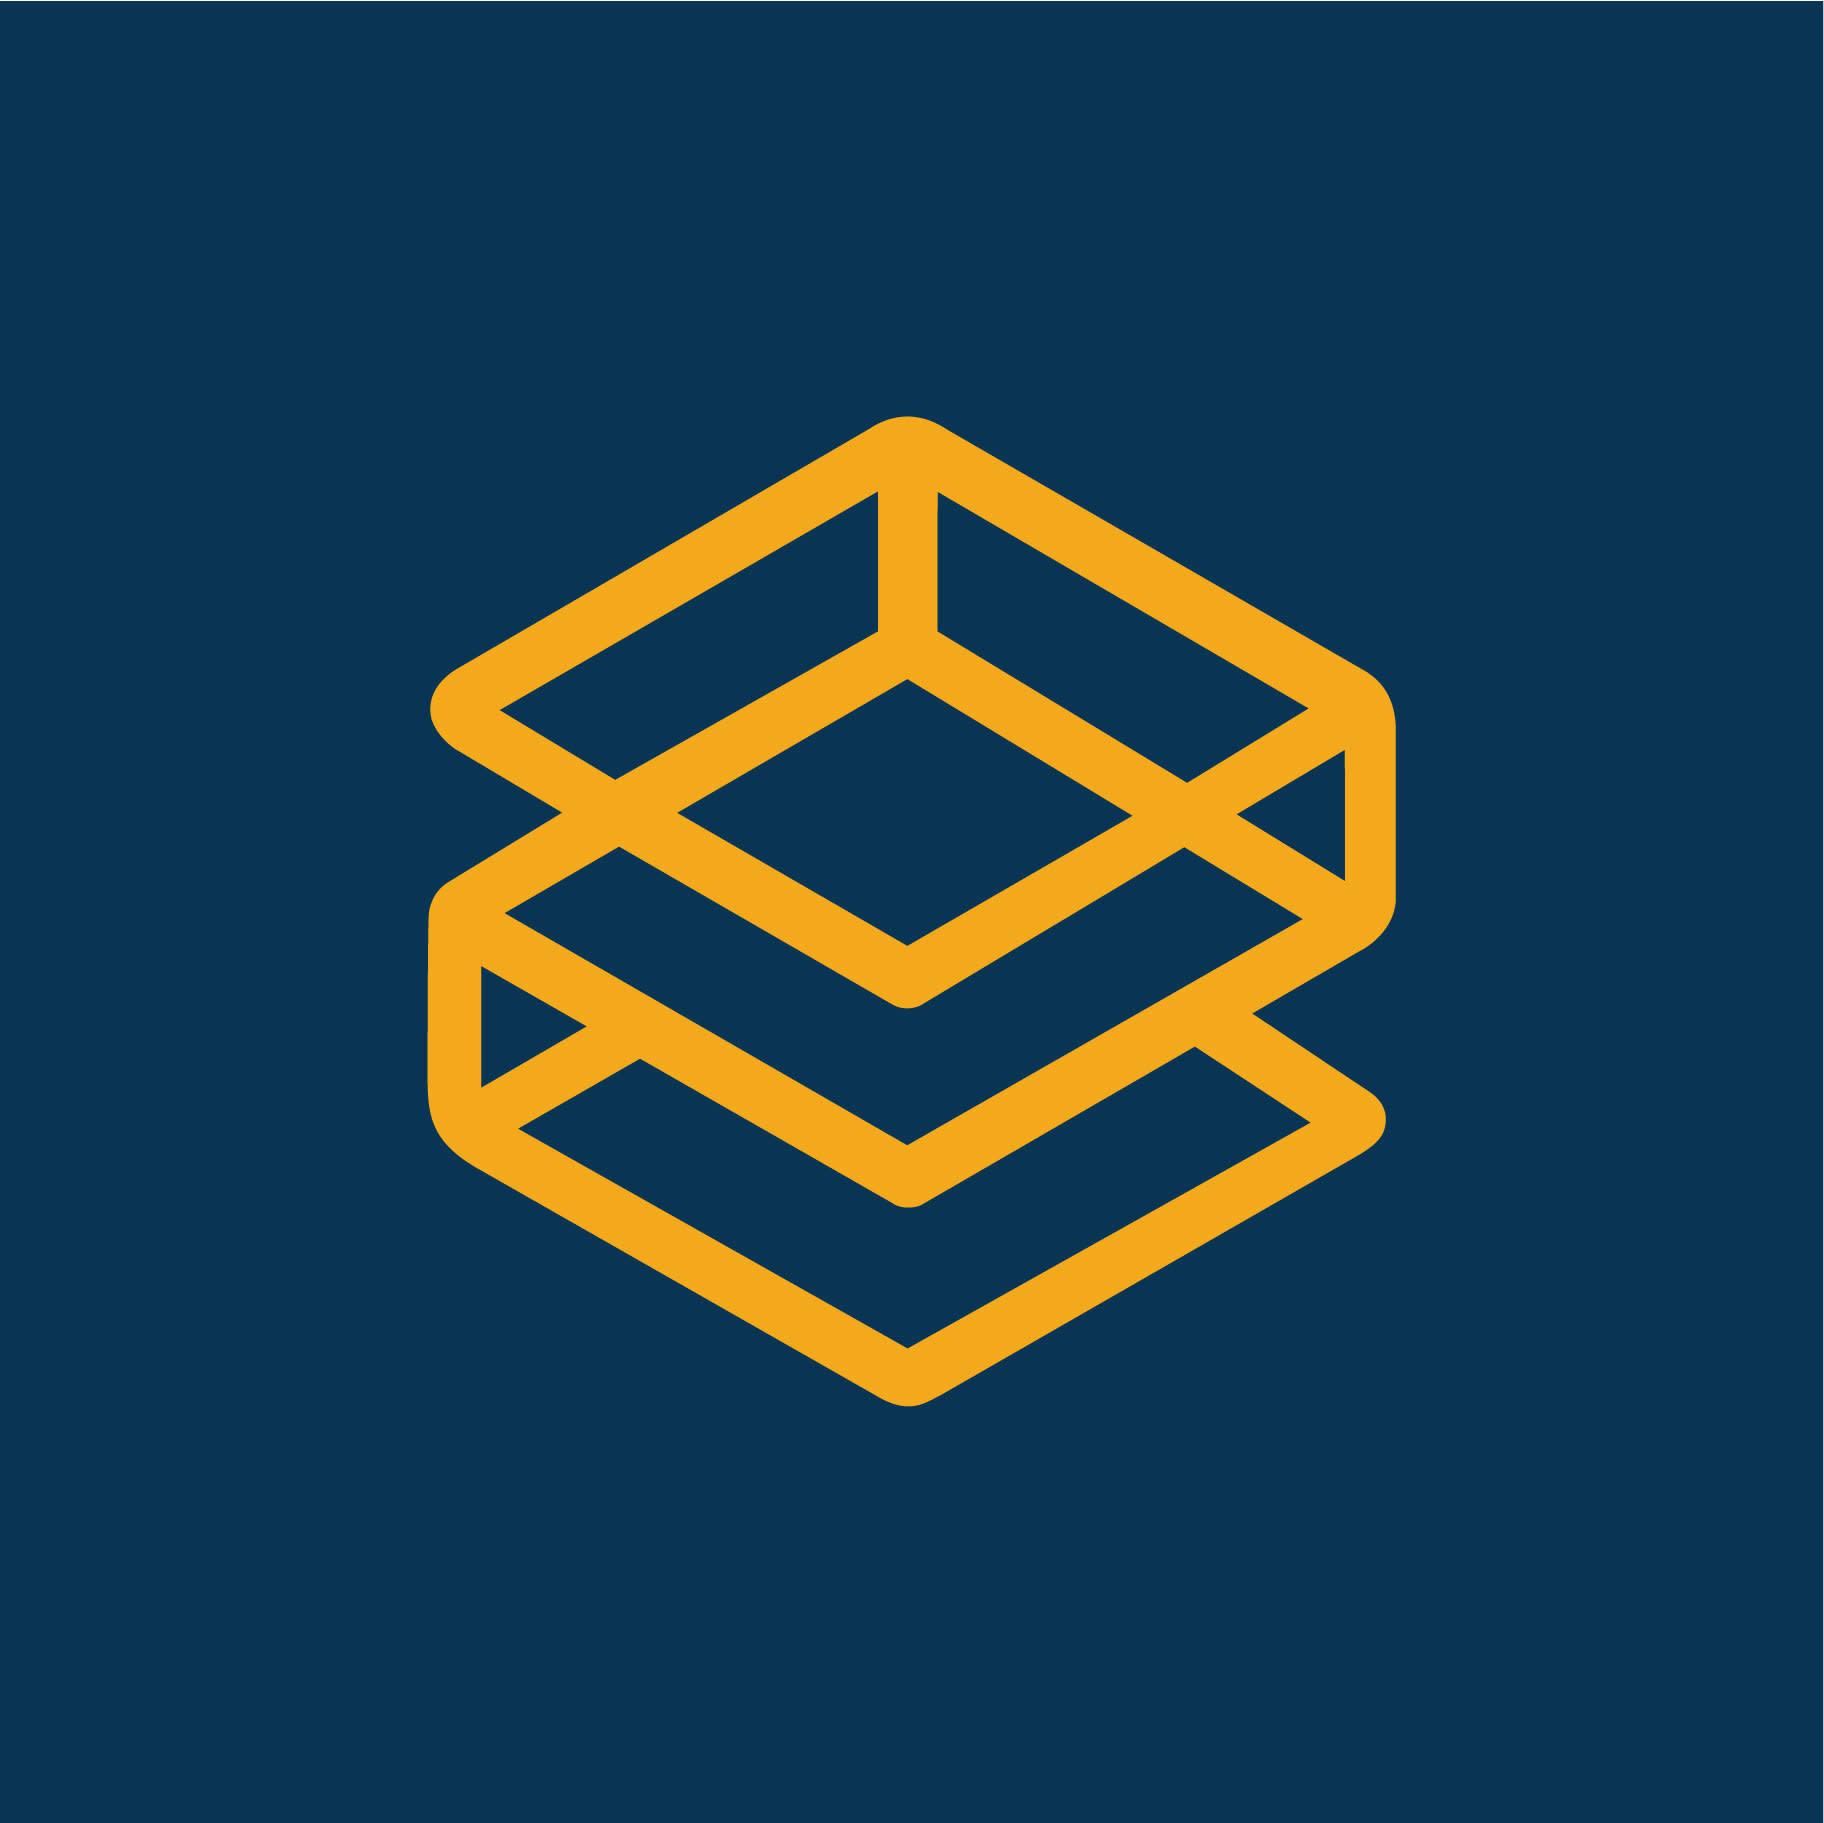 TrueLayer's logo